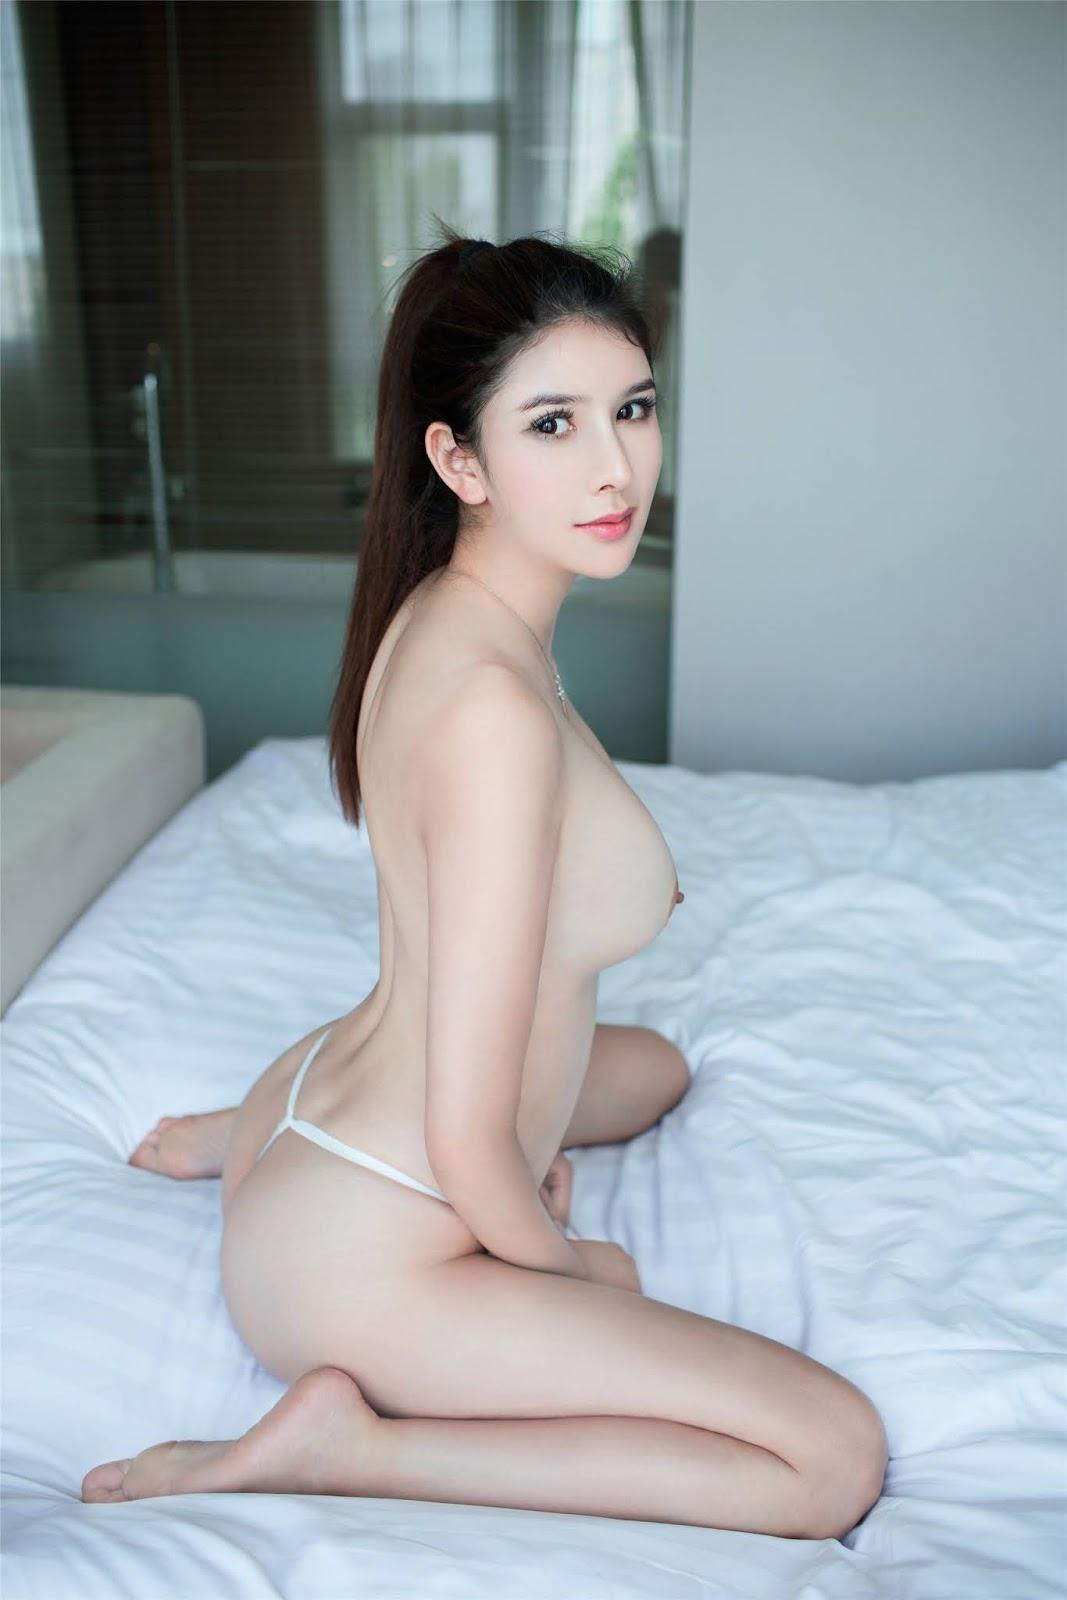 BoolWowGirls%2B%252819%2529 - Li LiSha 李丽莎 Beautiful Nude Model